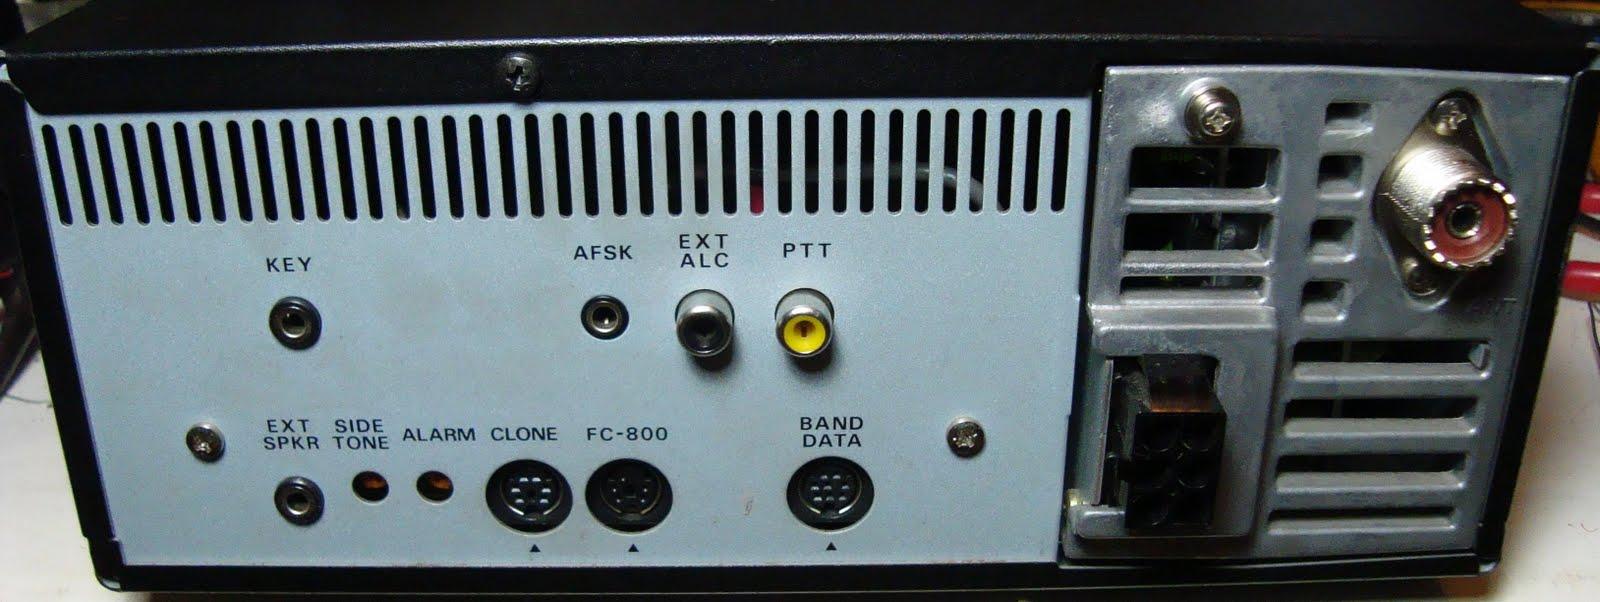 Radio Seller Yaesu System 600 Sold